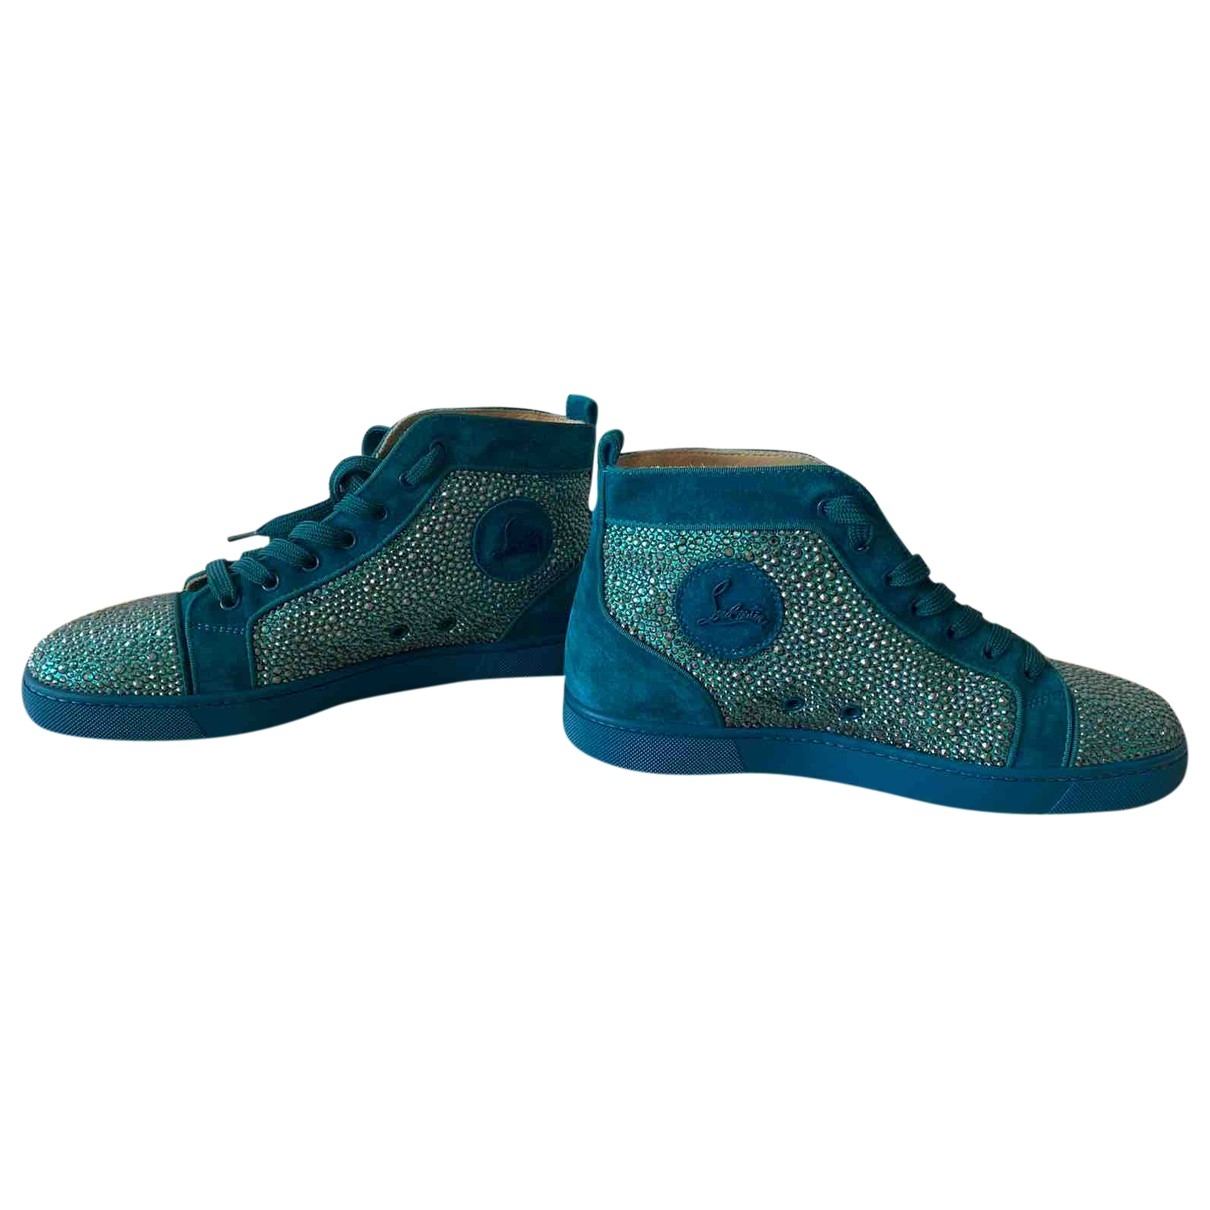 Christian Louboutin Louis Sneakers in  Tuerkis Mit Pailletten